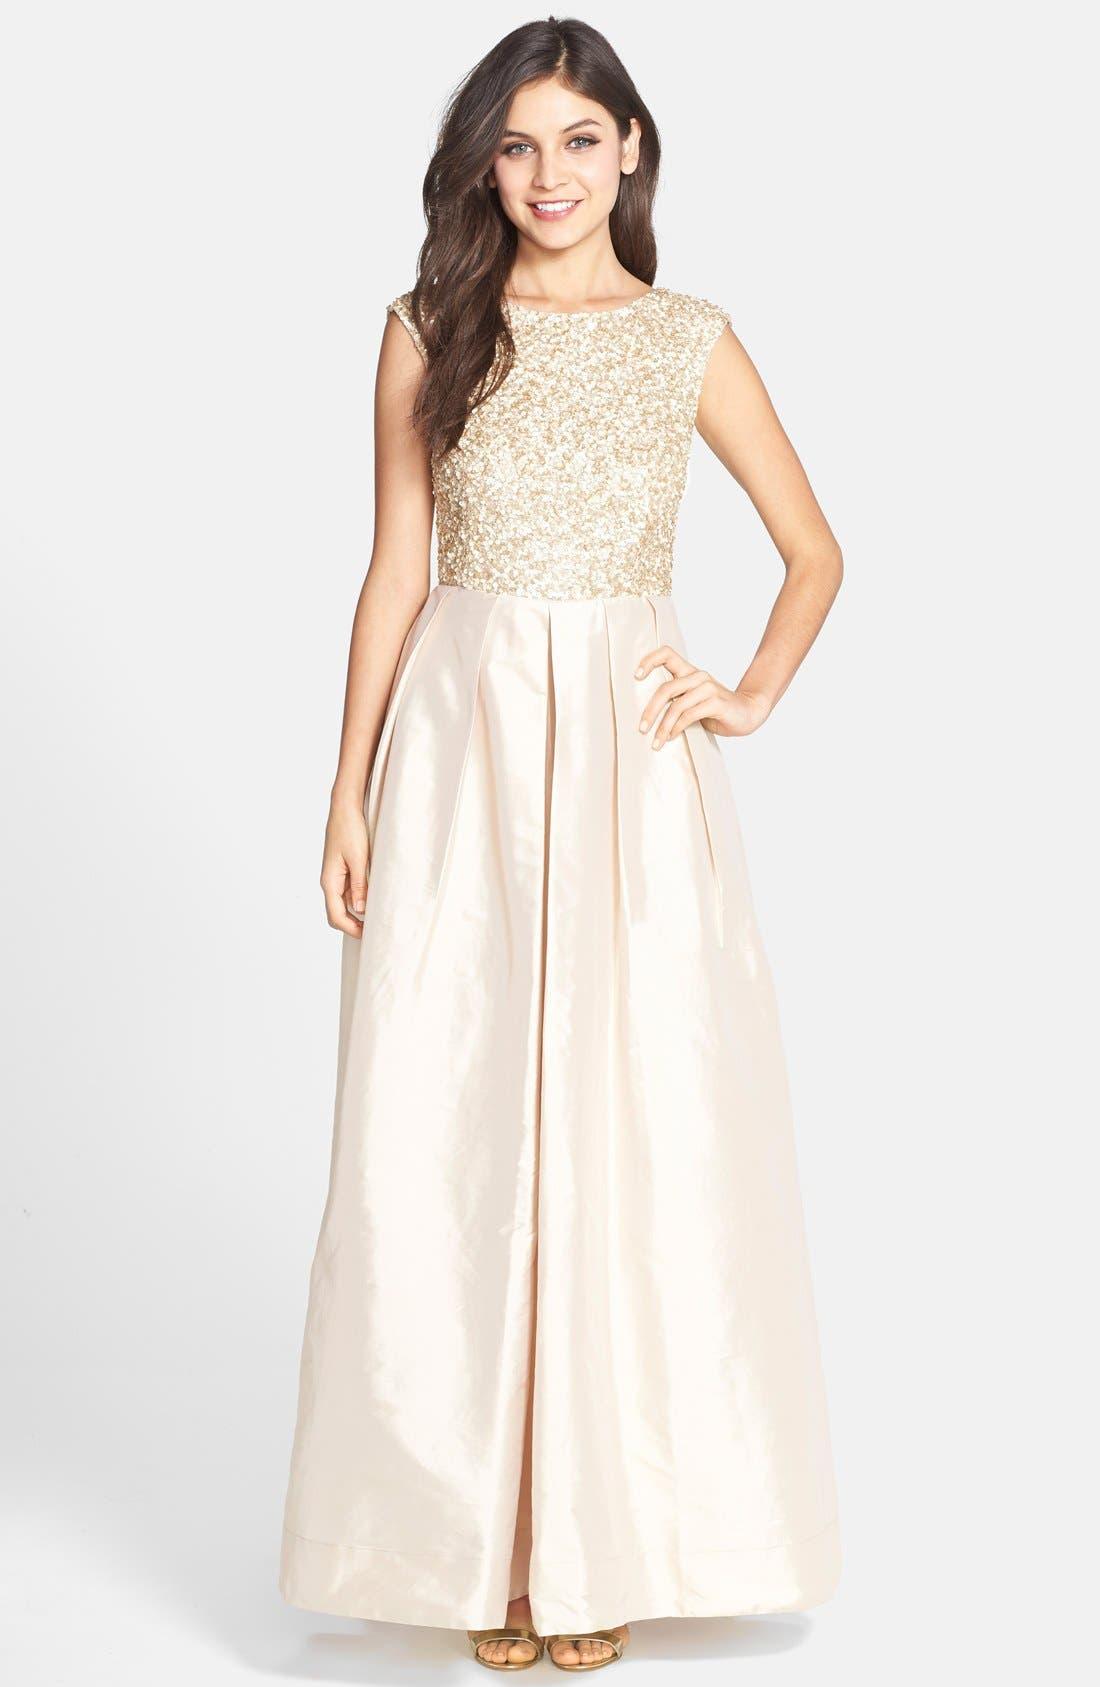 Alternate Image 1 Selected - Aidan Mattox Embellished Bodice Taffeta Gown